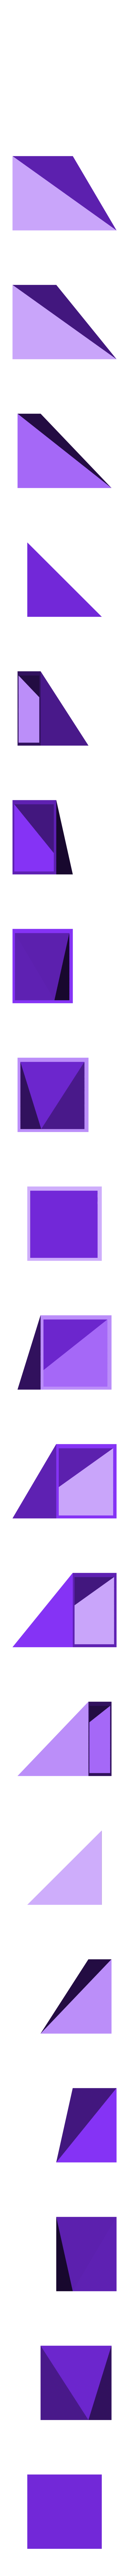 LiuHuiThird_VerB.stl Download free STL file Thirds Cube Dissection, Many Styles, Liu Hui • 3D printer template, LGBU